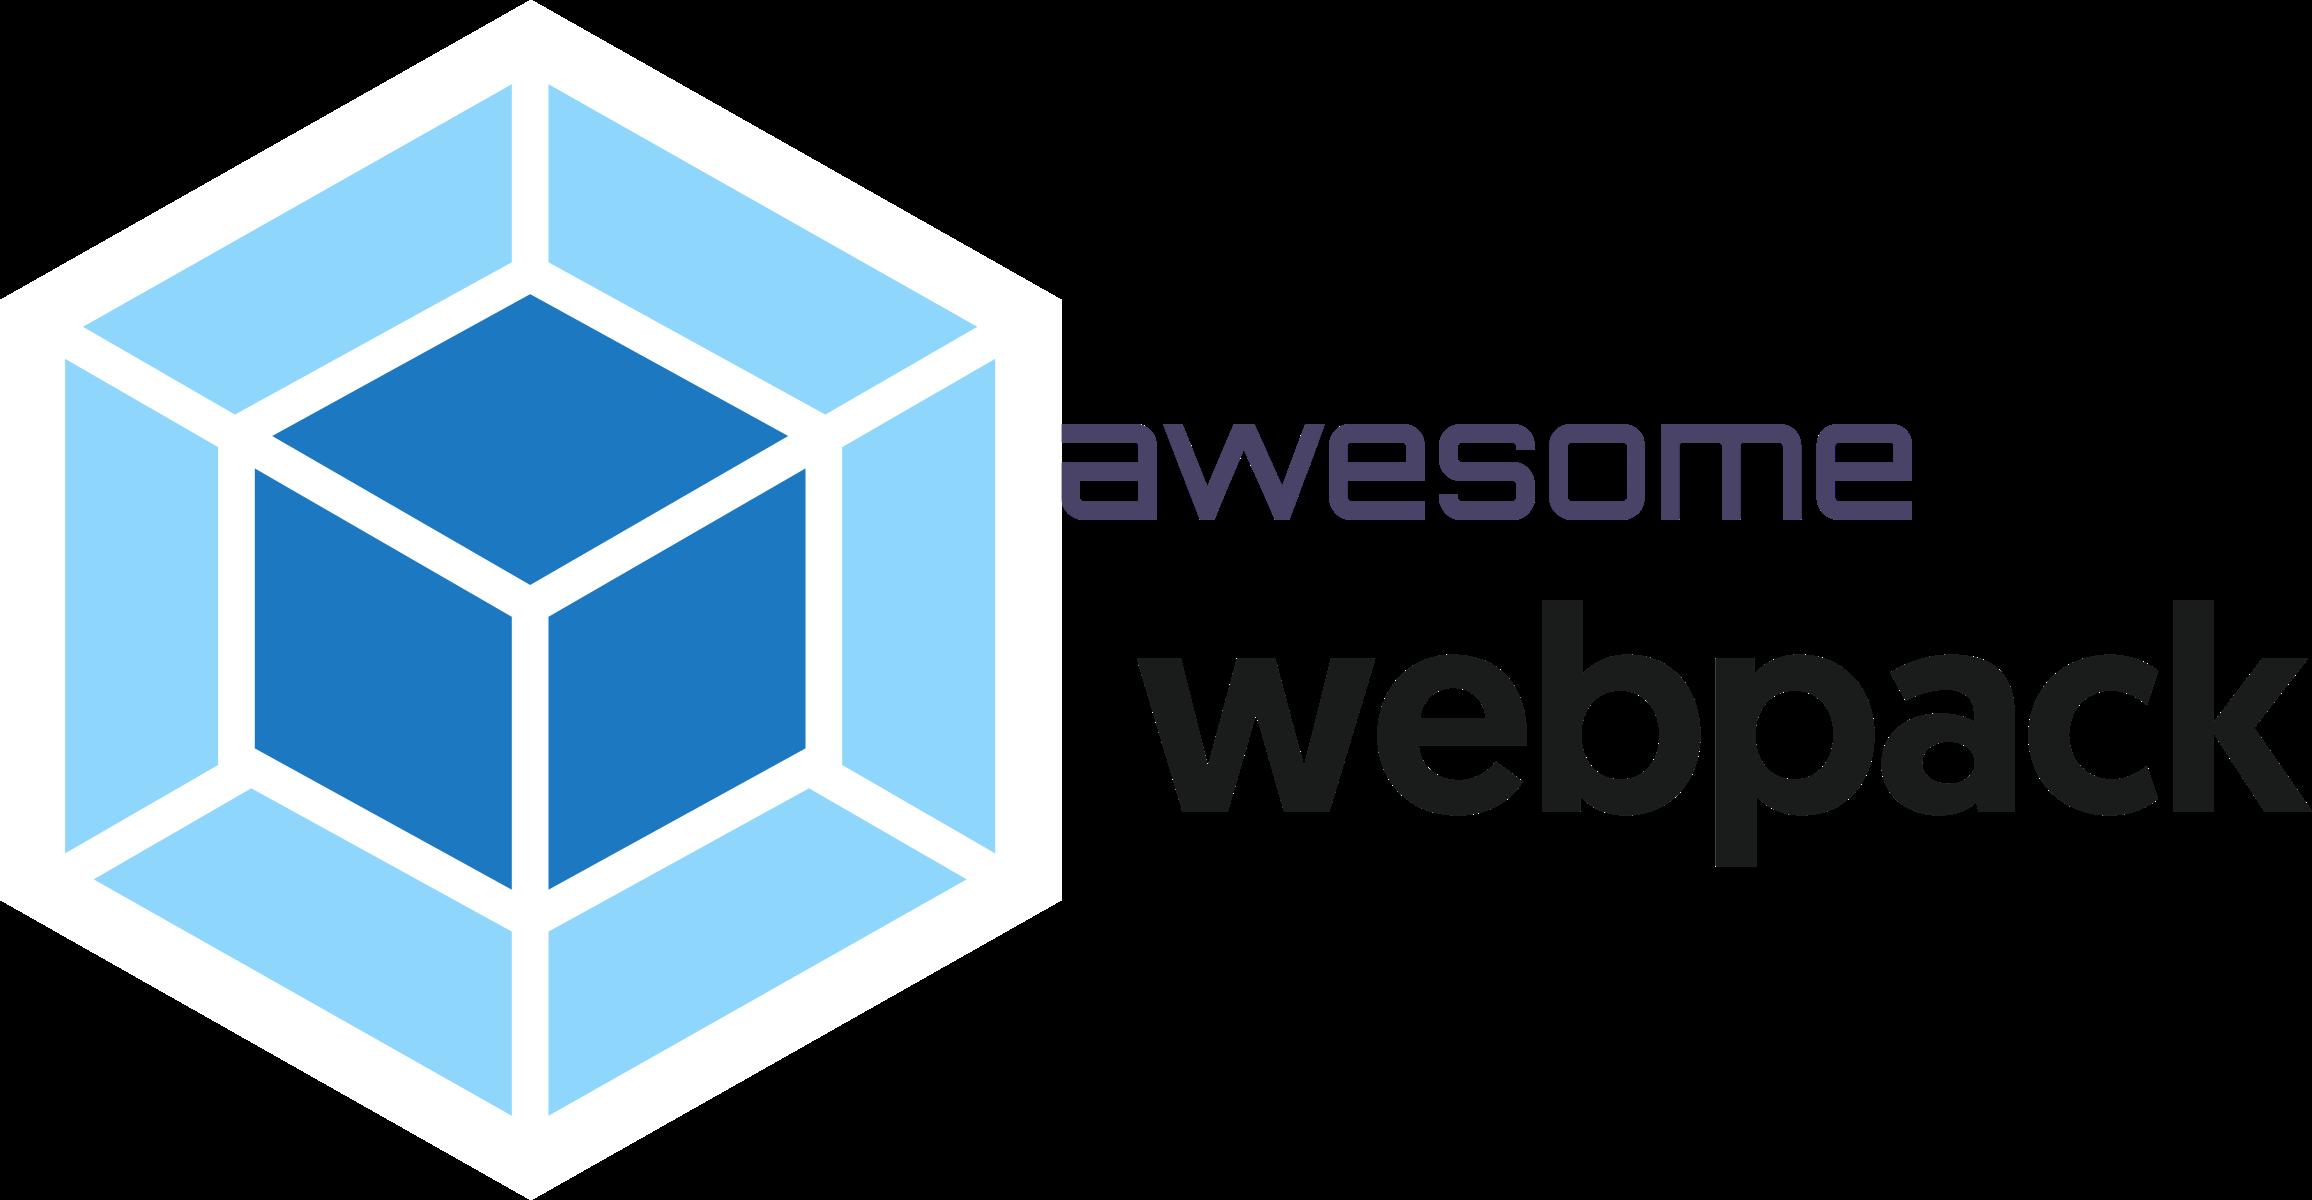 awesome-webpack